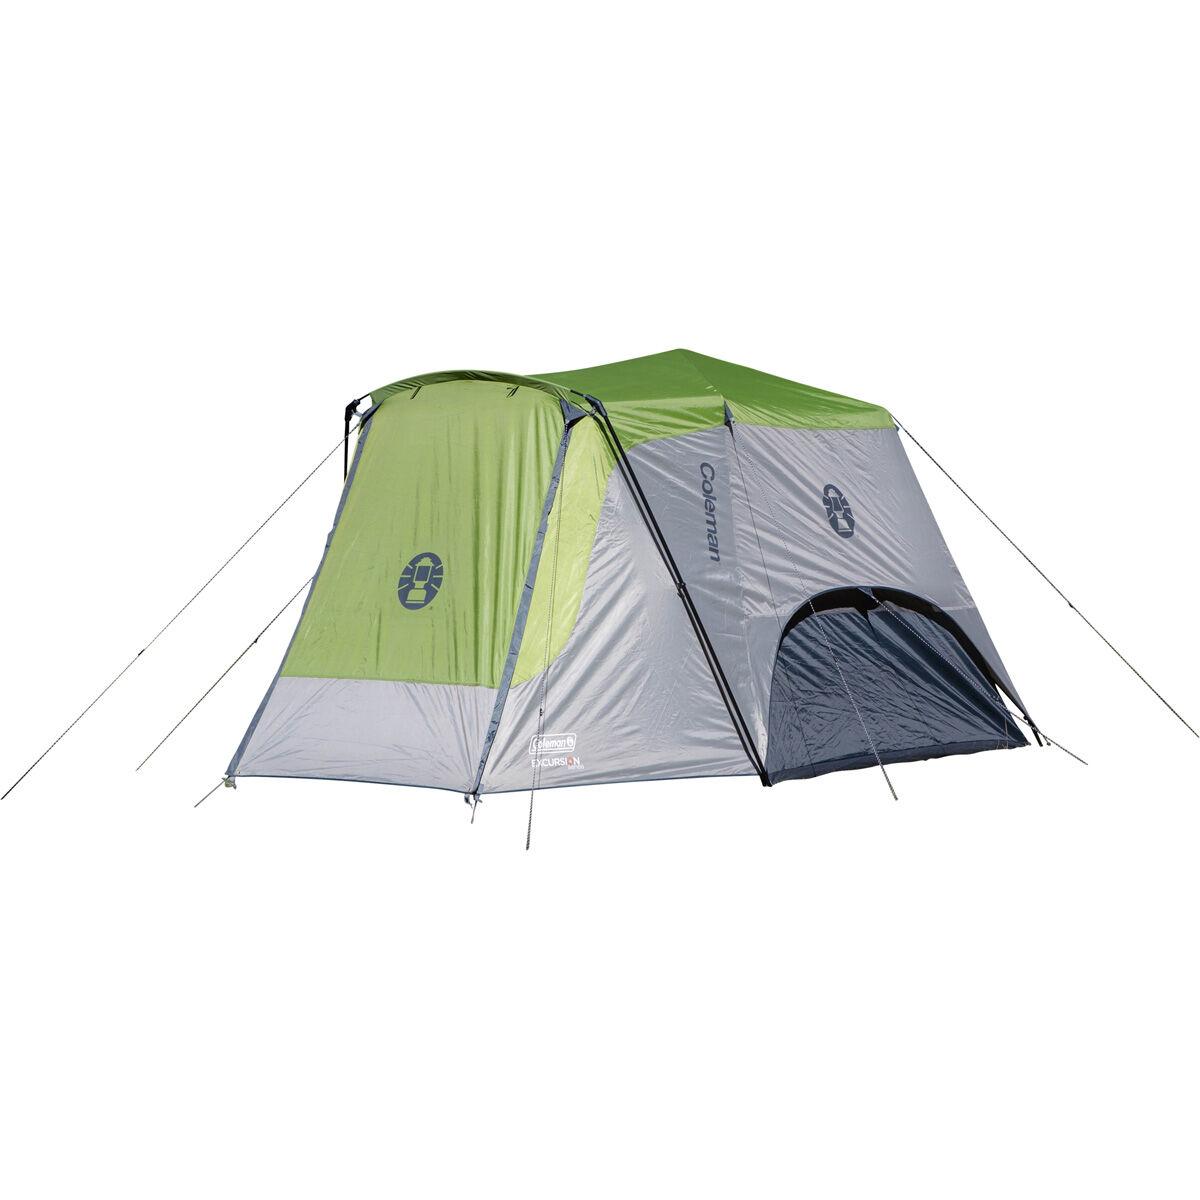 Coleman Excursion Instant Up Tent 6 Person  bcf_hi-res  sc 1 st  BCF Australia & Coleman Excursion Instant Up Tent 6 Person | BCF